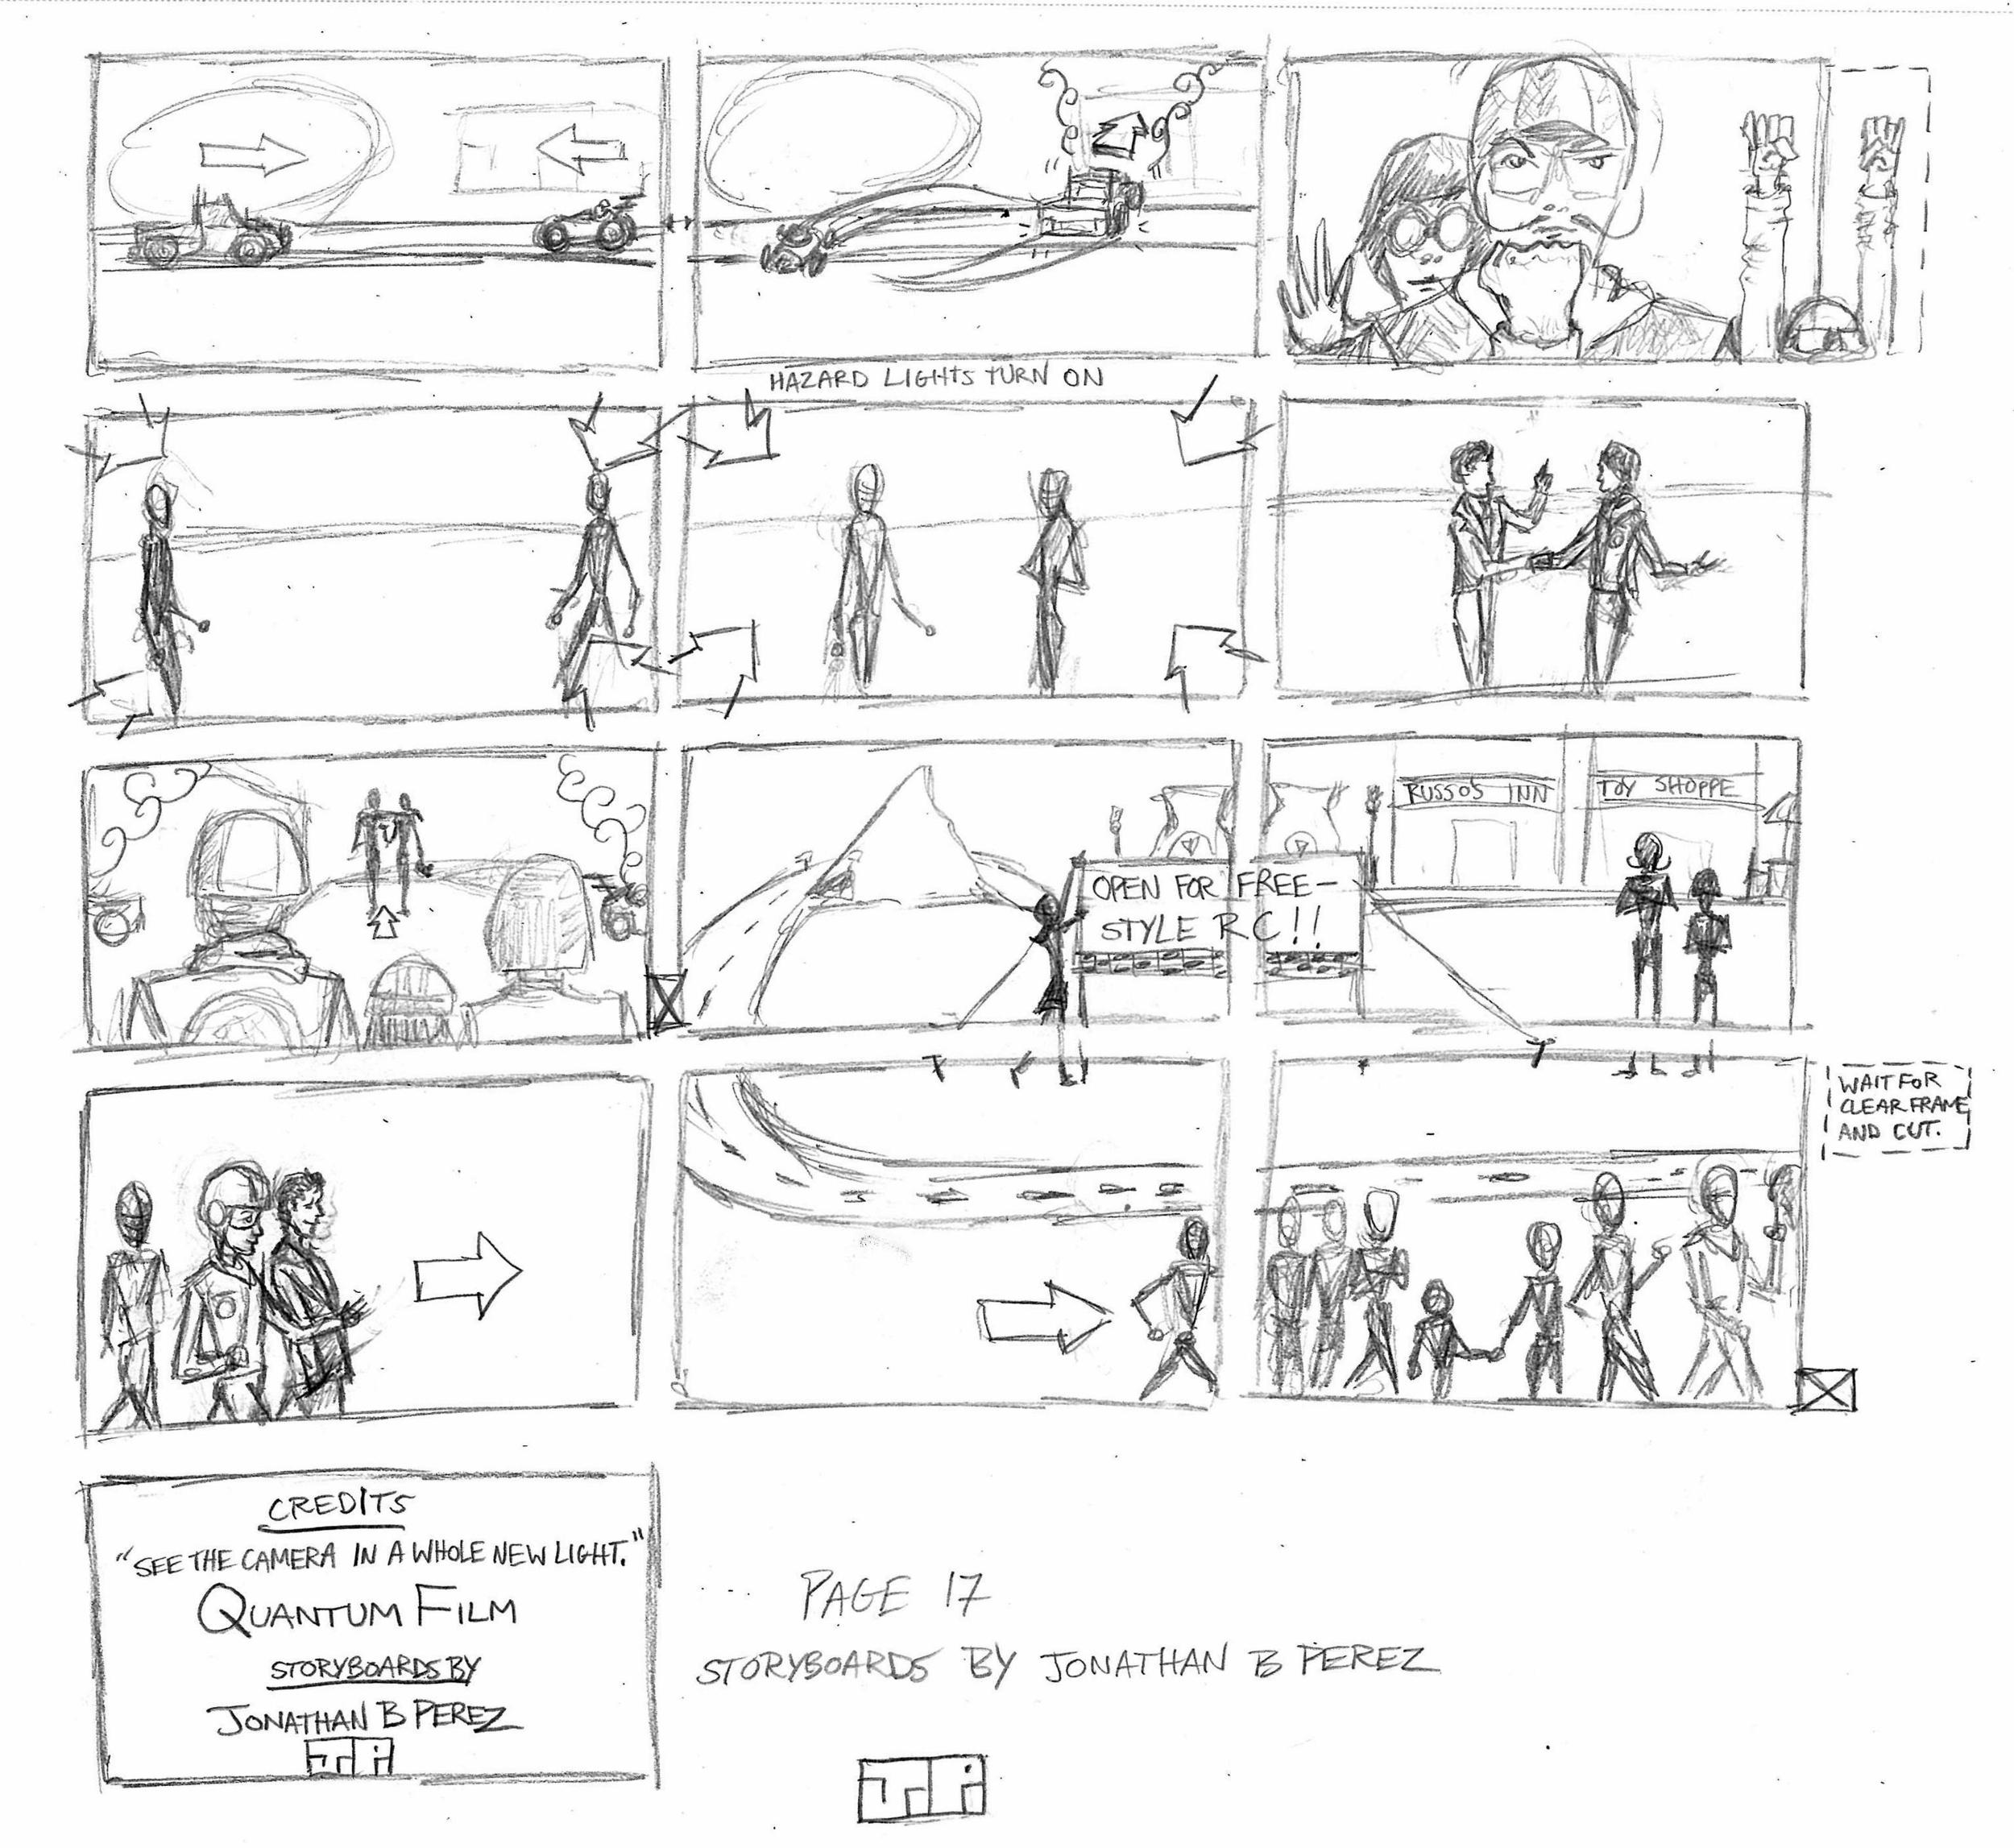 Prix Storyboard_PG017 - Film and TV - Jonathan B Perez - cREAtive Castle Studios.jpg